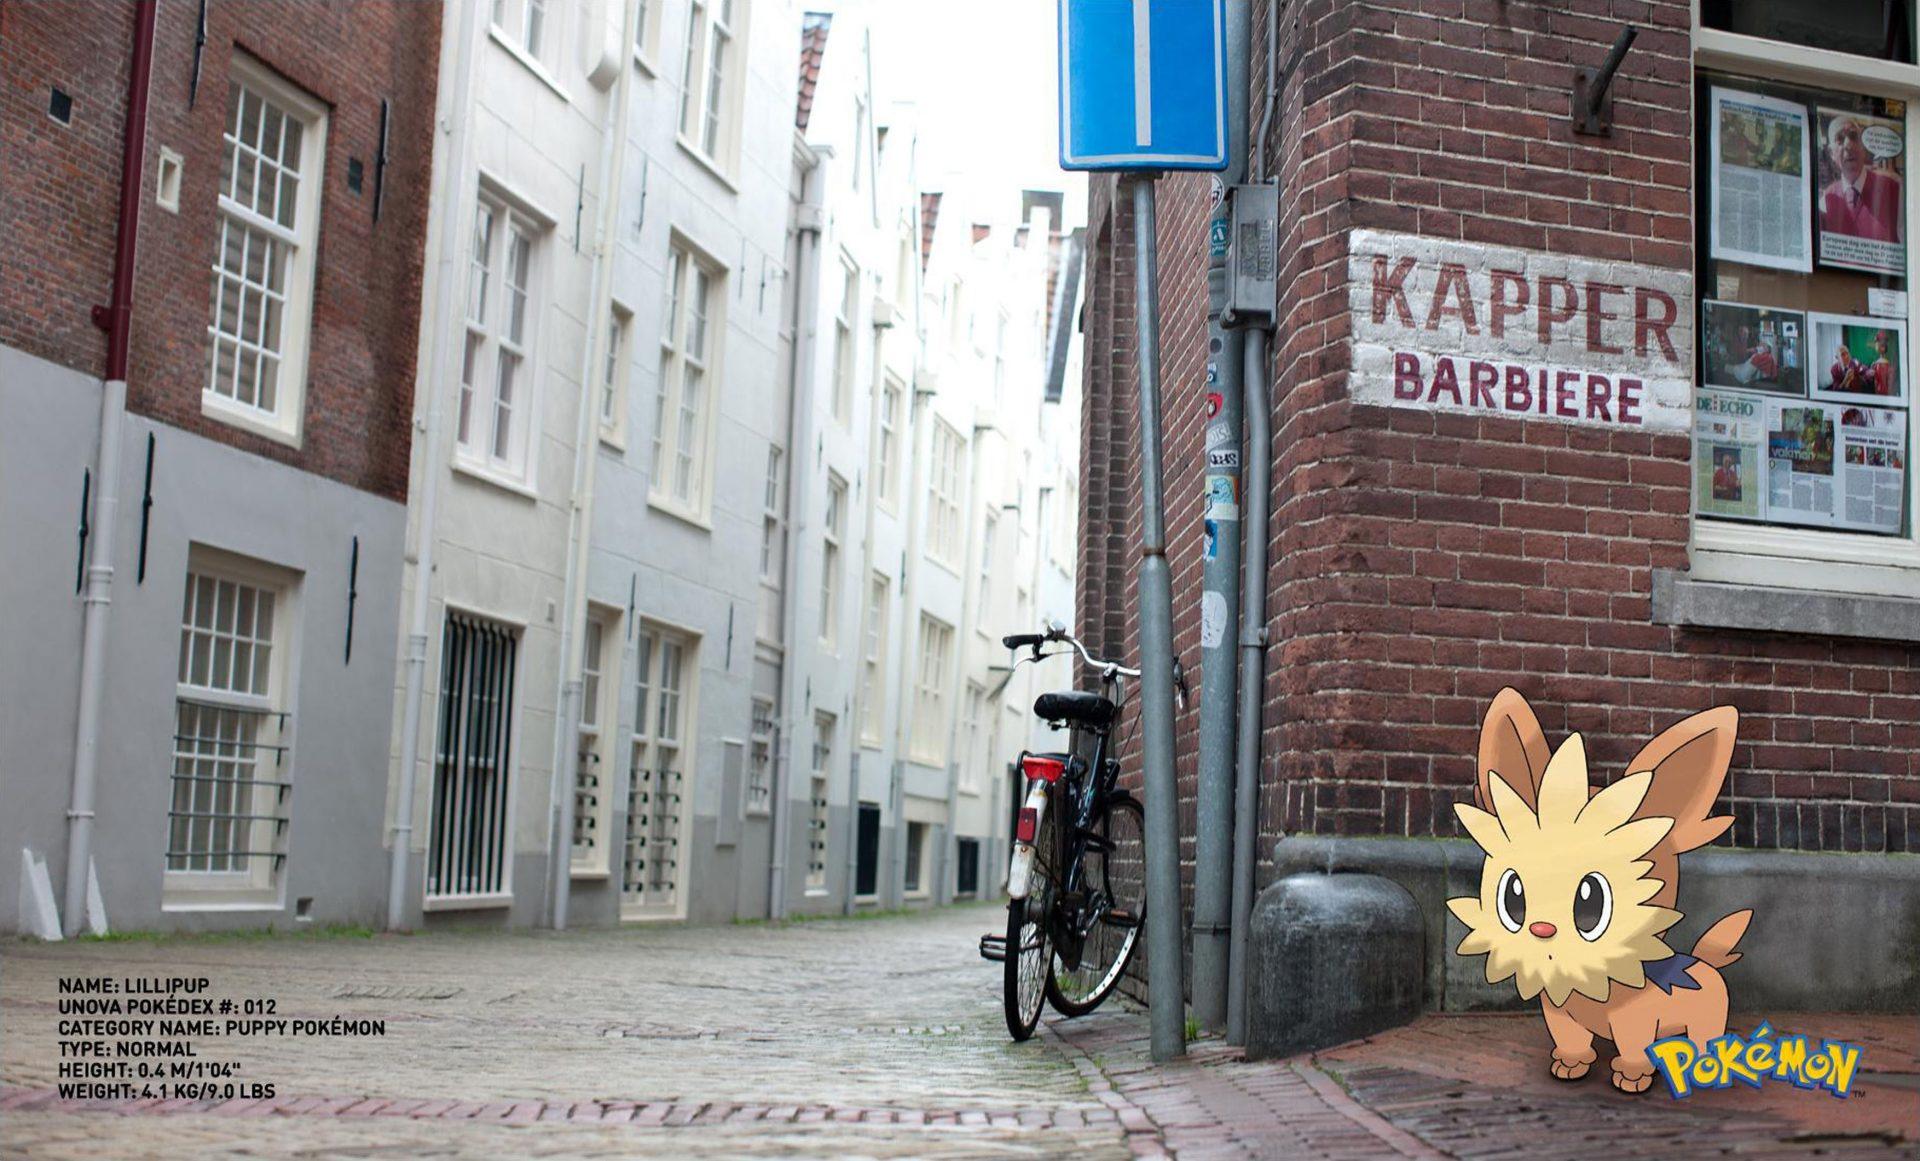 Kapper Barbiere Pokemon Go Lillipup  Puppy Pokemon Dog on street corner Dentsu London Shaw and Shaw Photography photographer